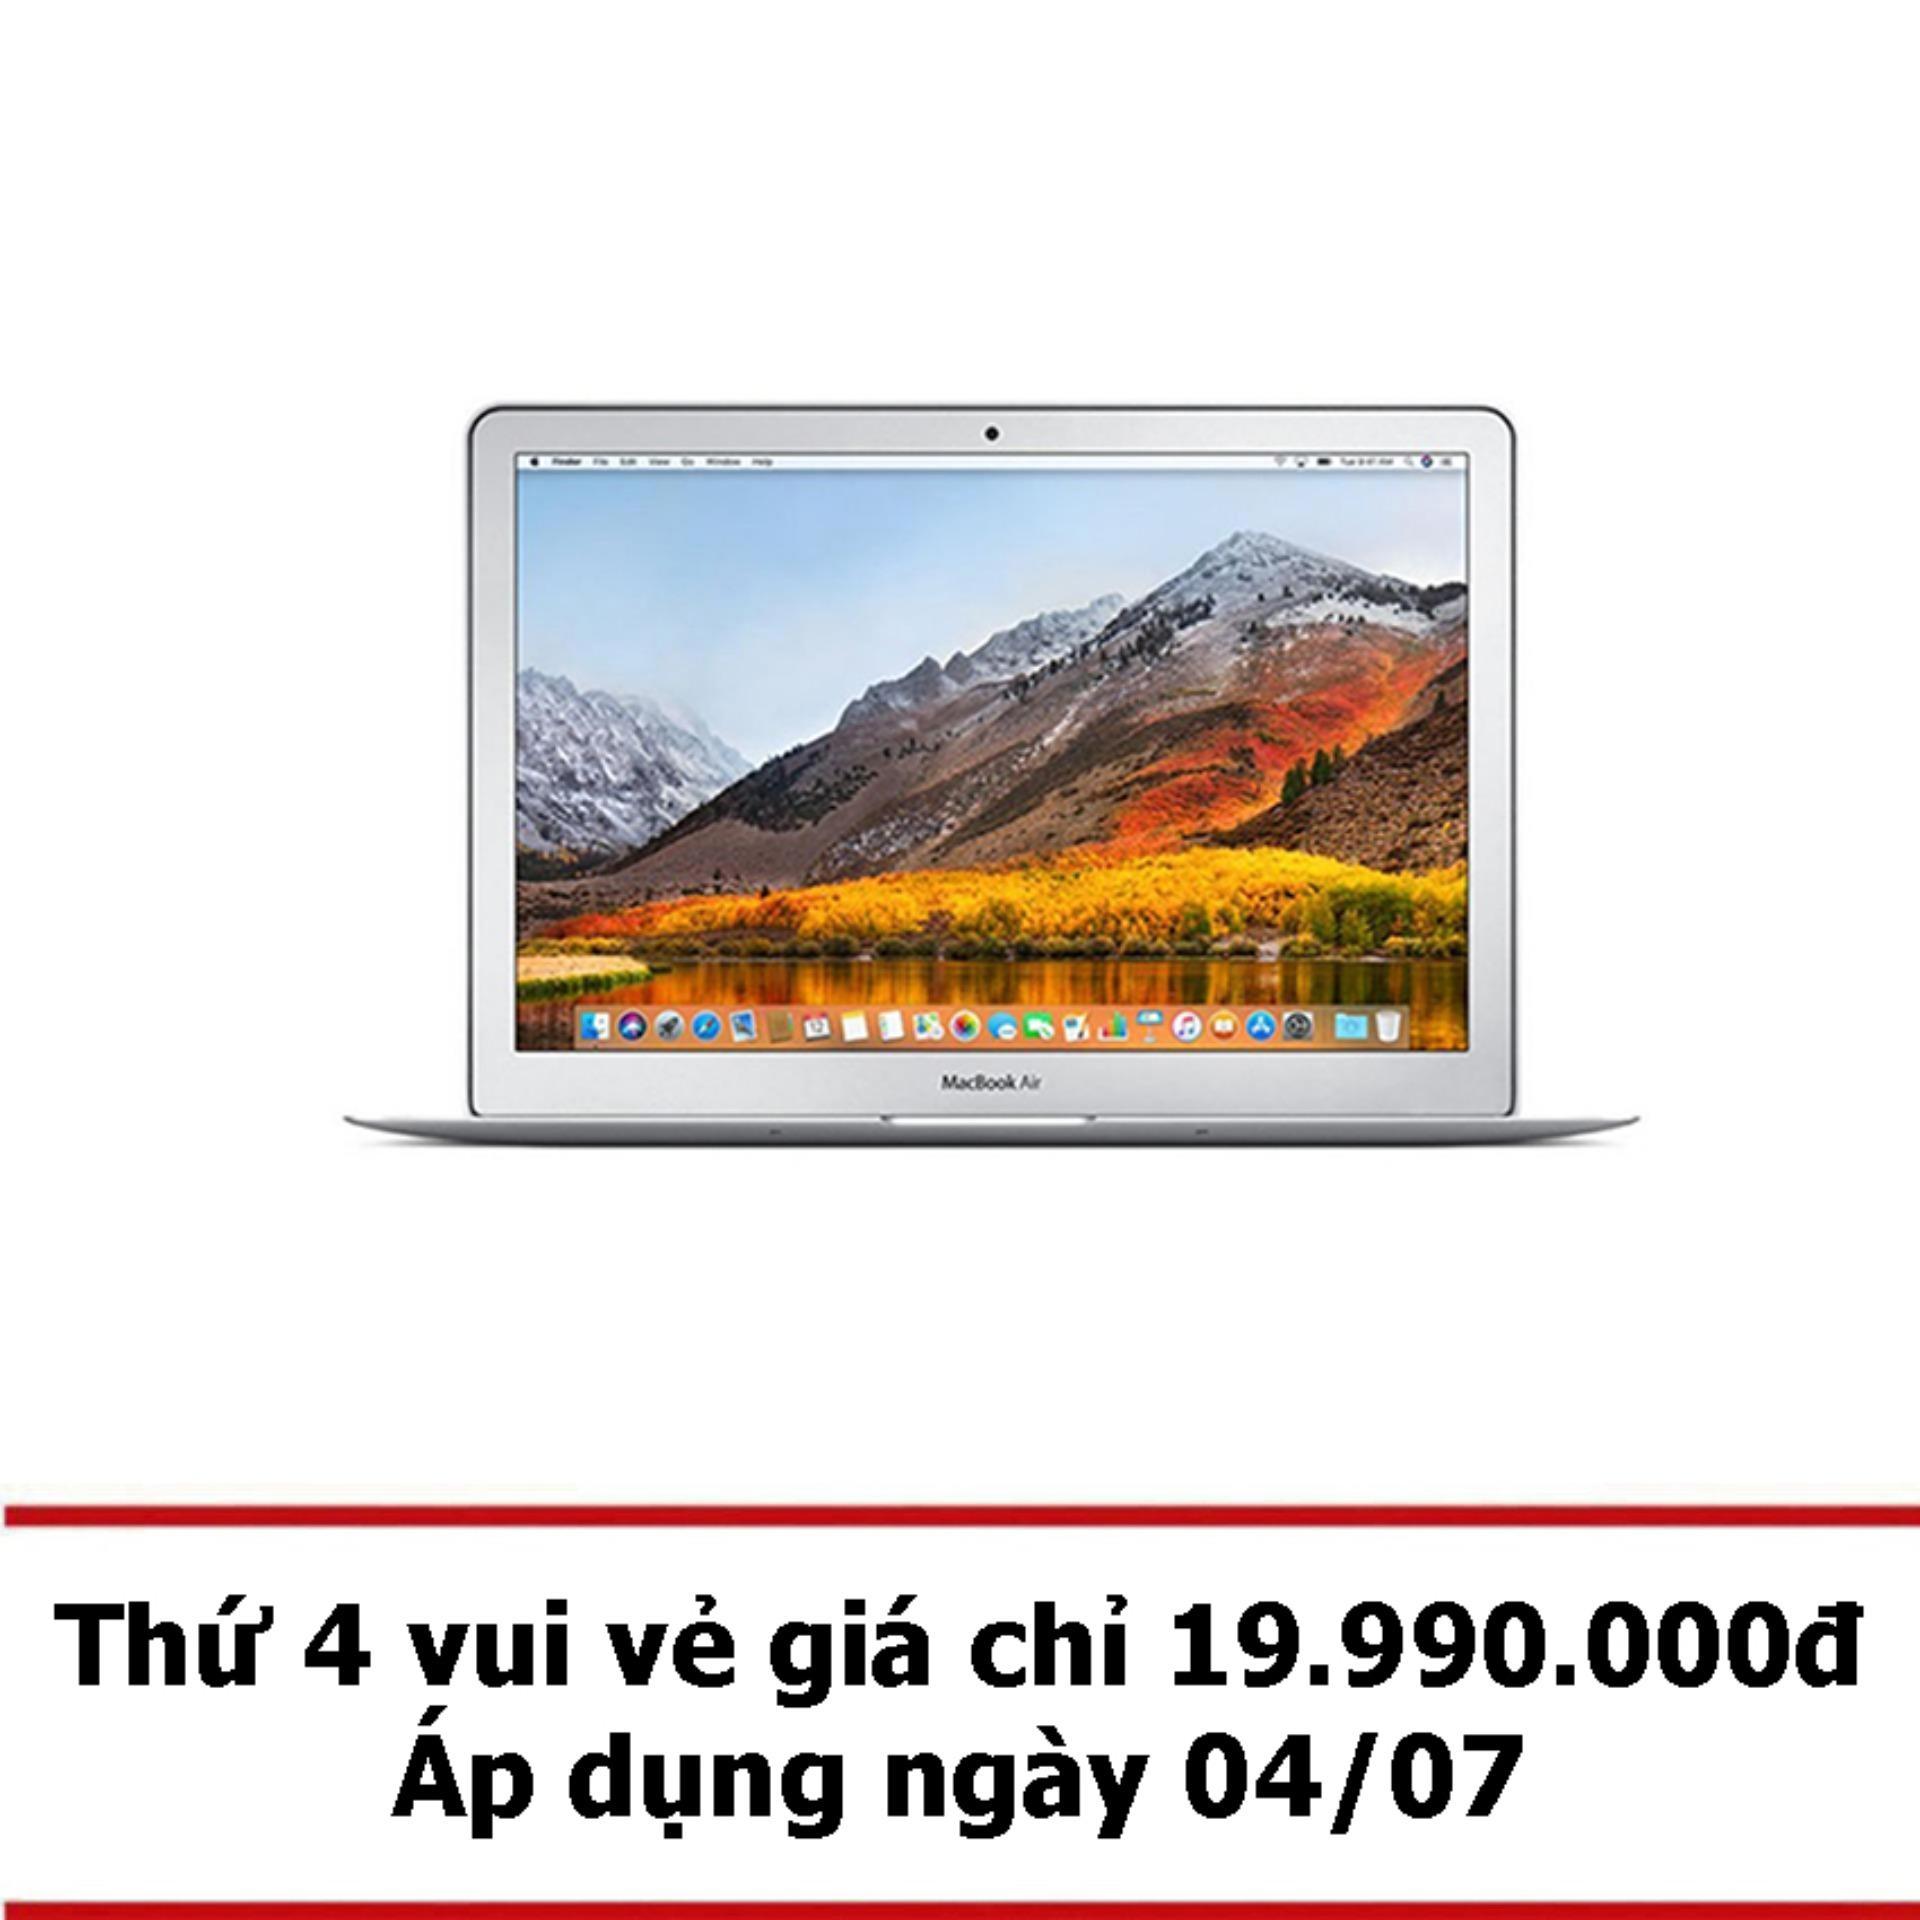 Apple MacBook Air 13-inch 1.8GHz dual-core Intel Core i5 128GB...